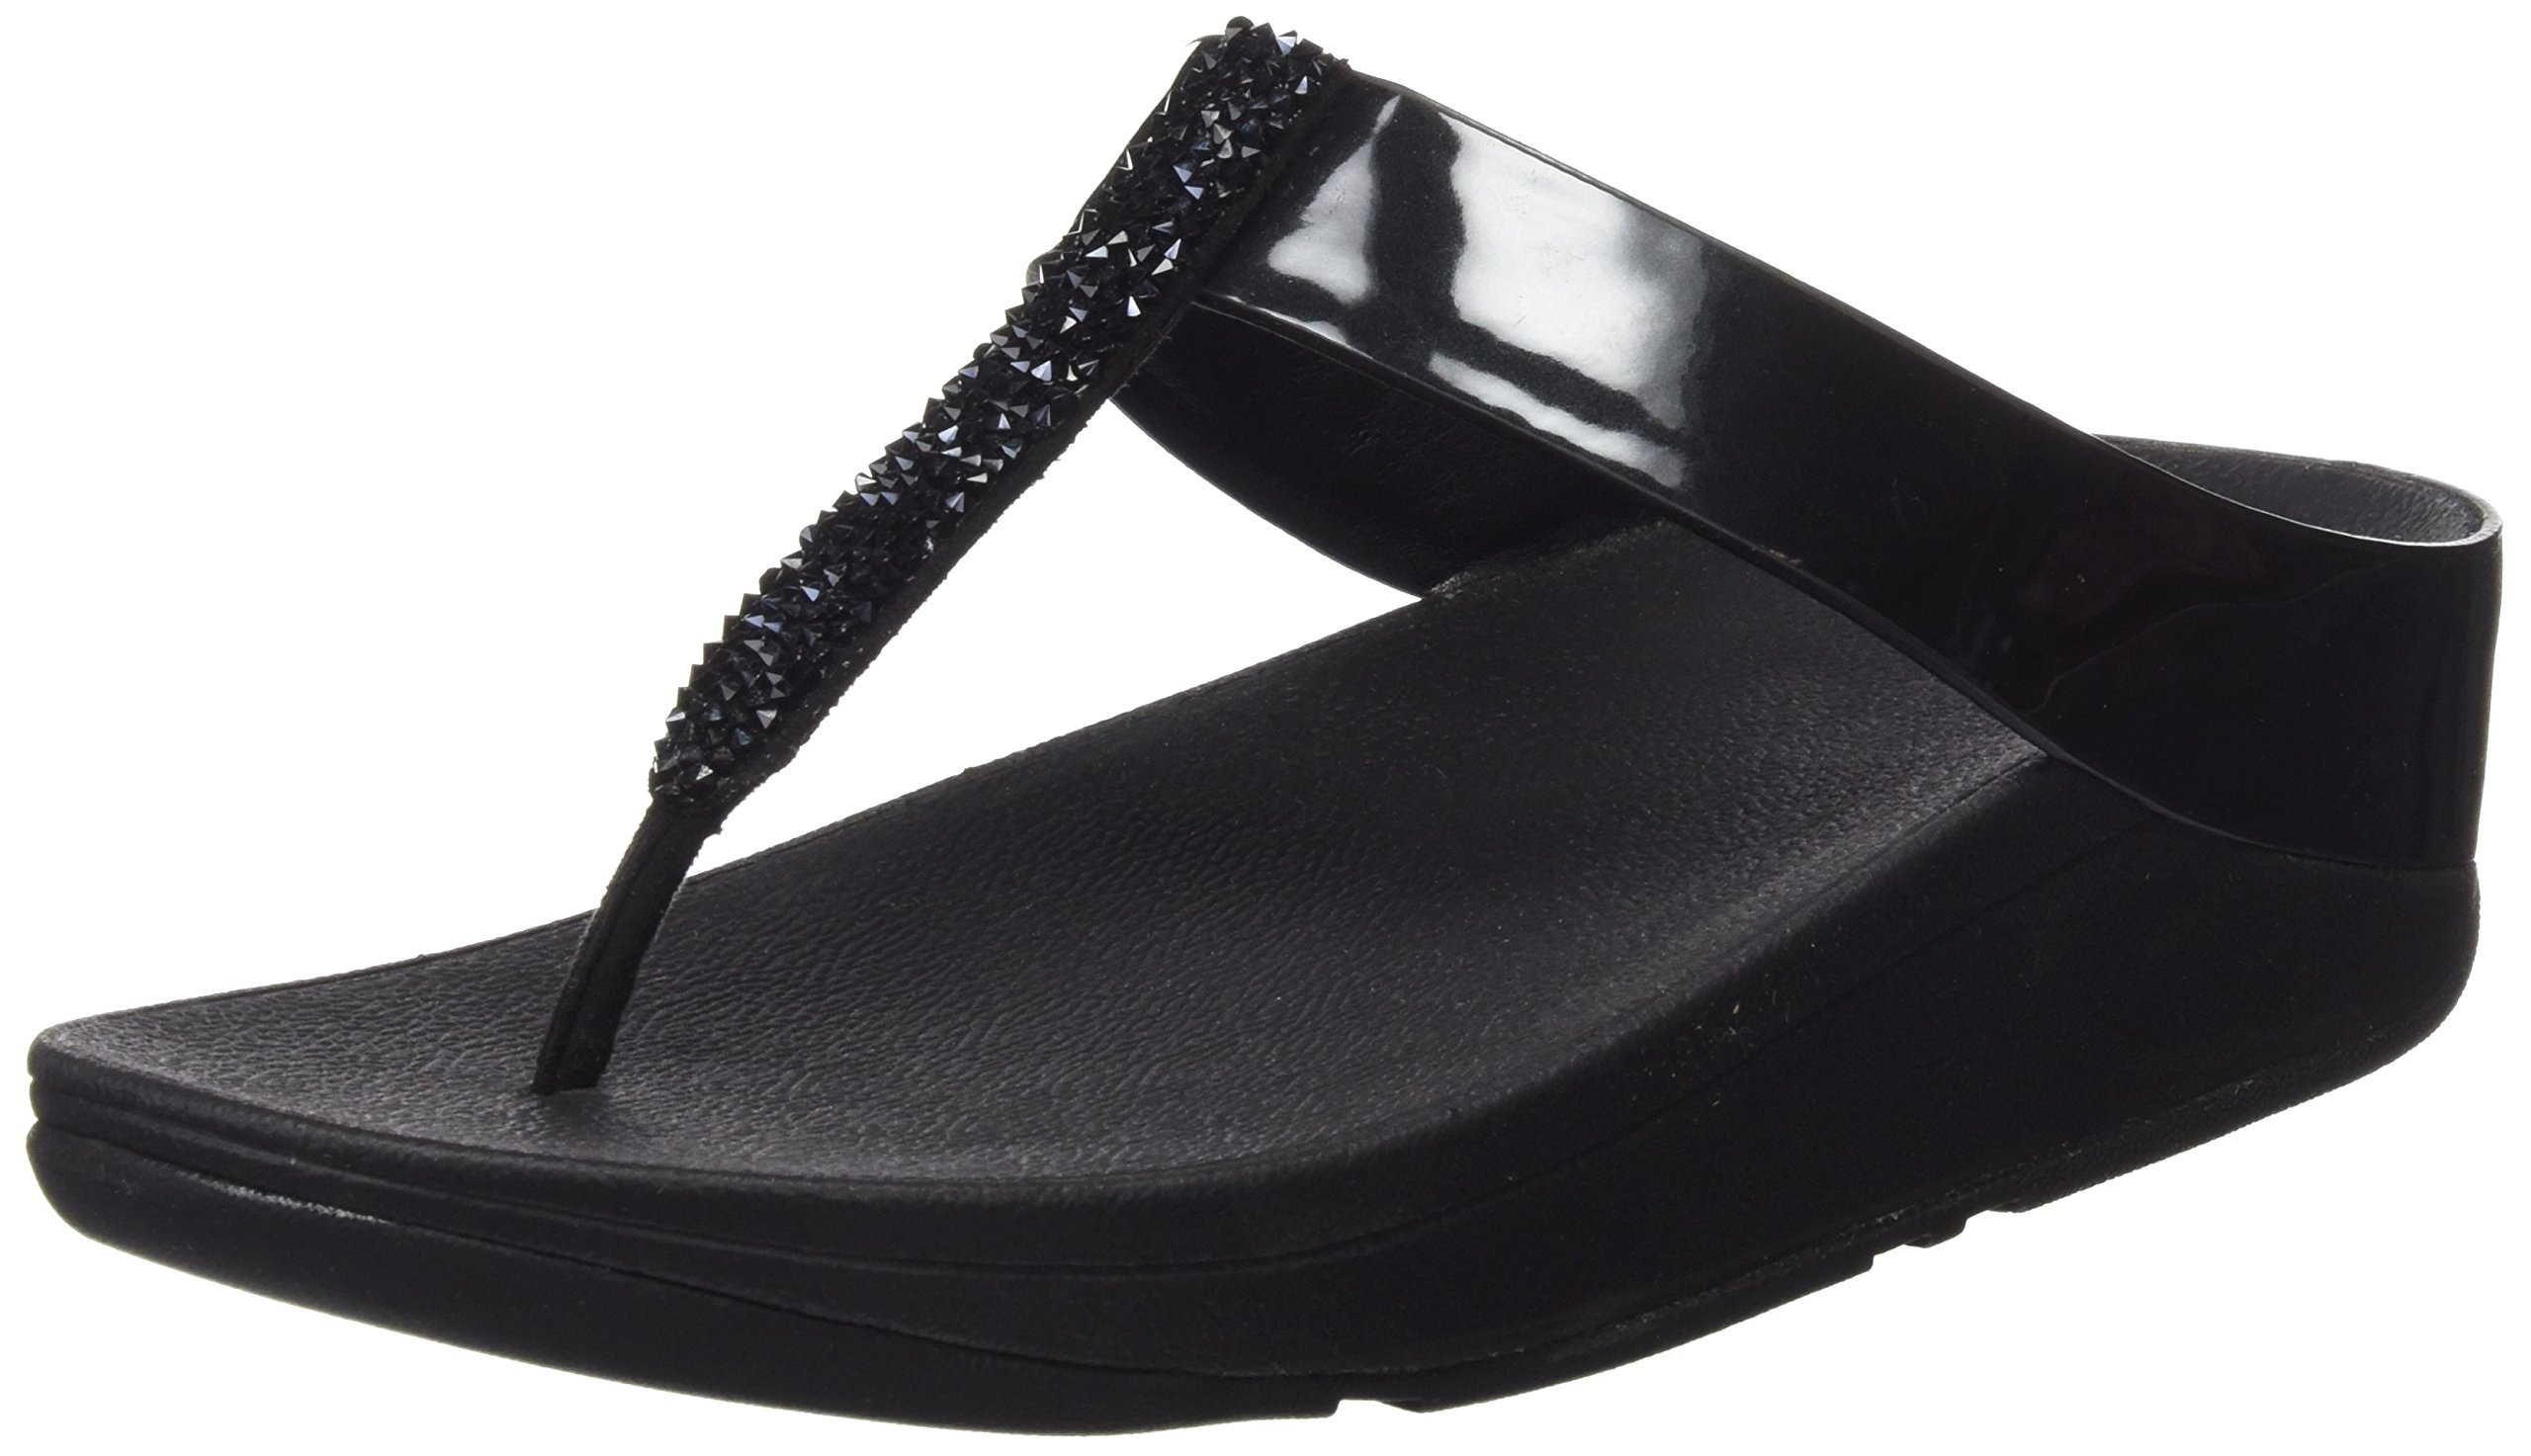 FitFlop Womens Fino Soft Metallic Toe-Thong Black Sandal - 8